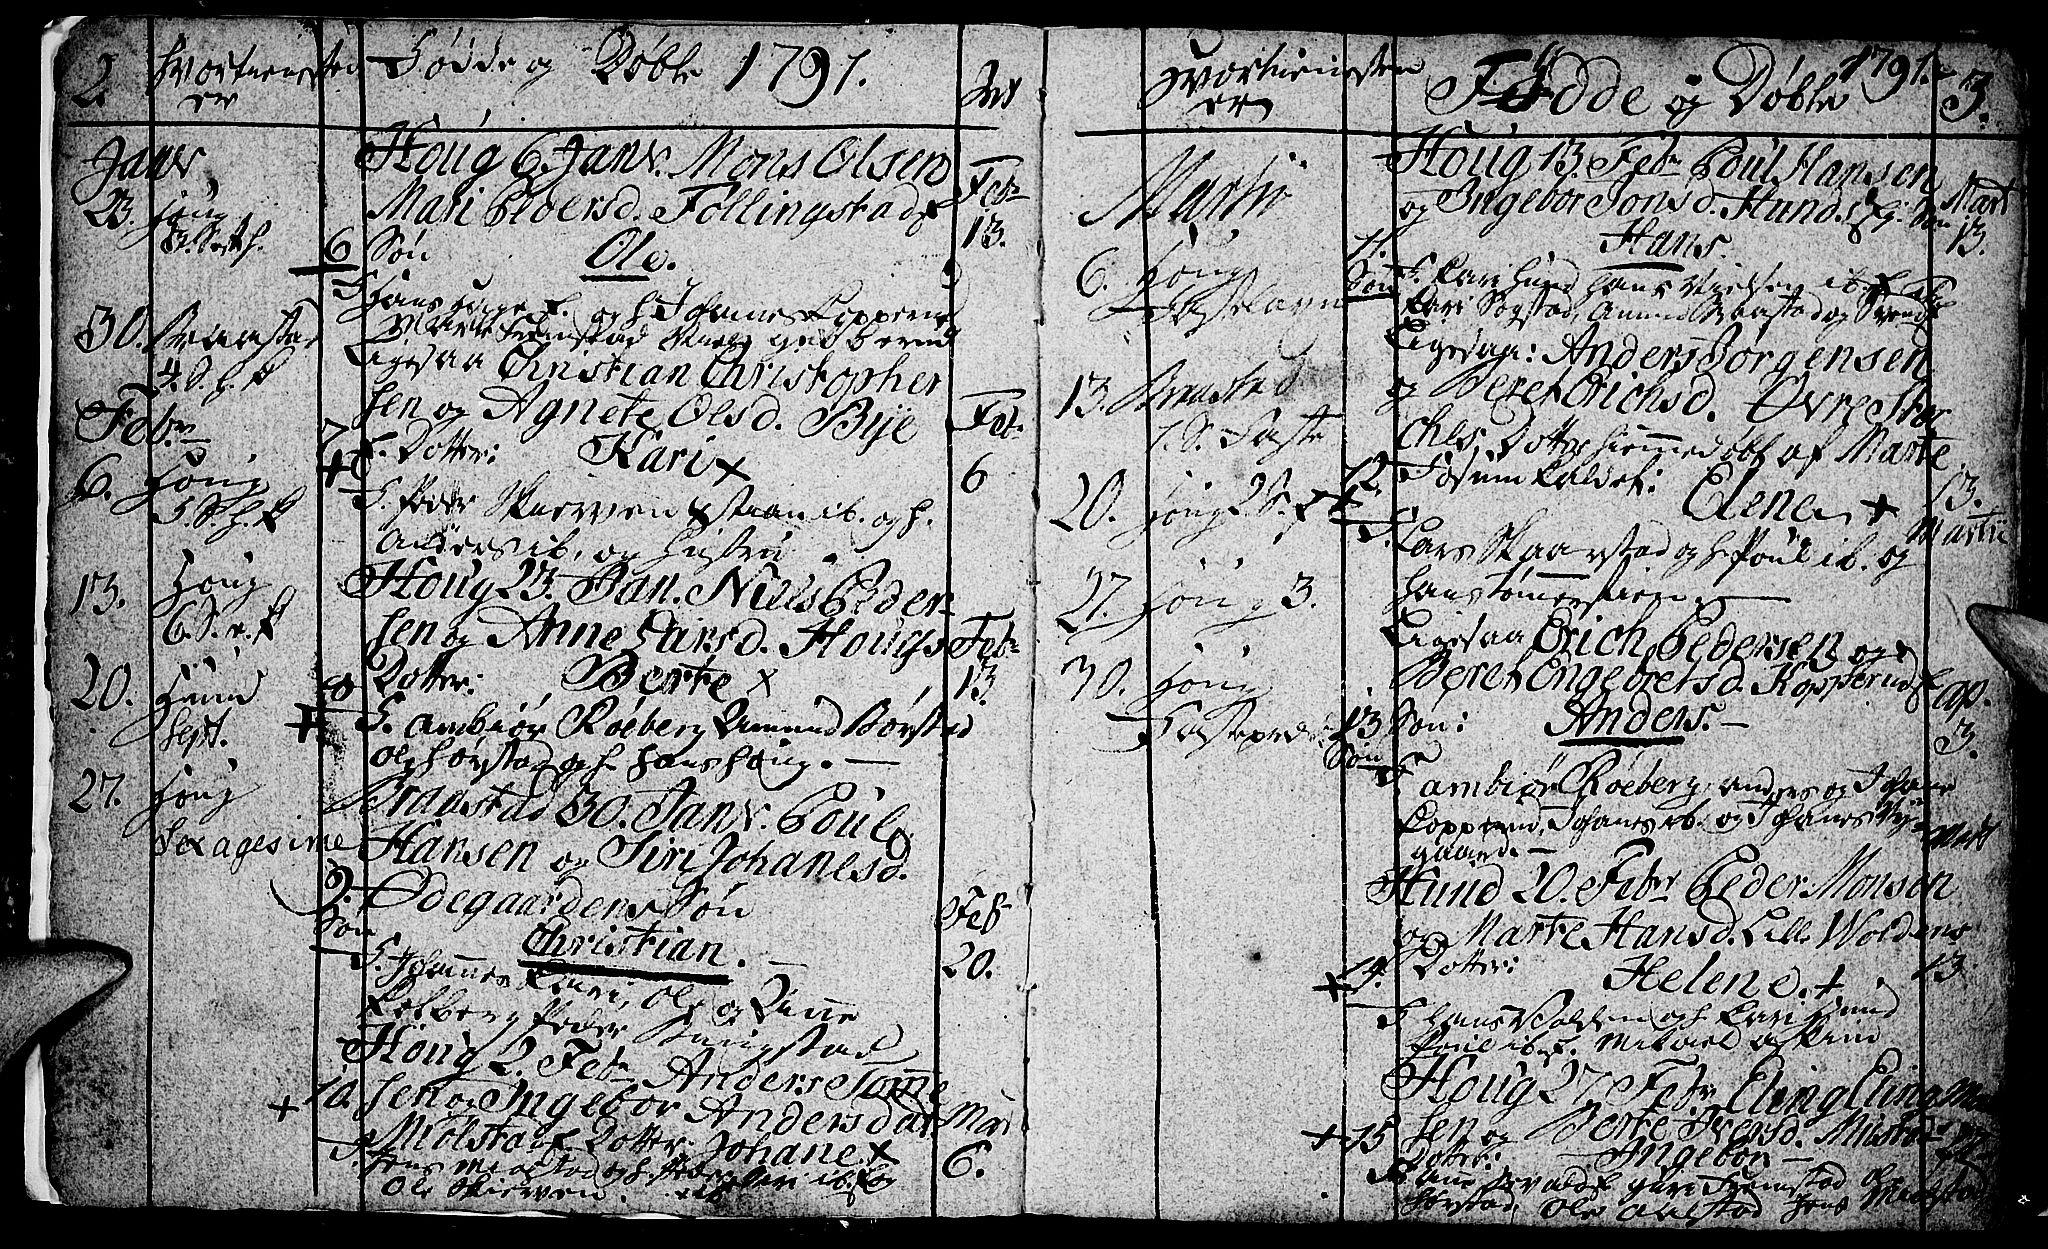 SAH, Vardal prestekontor, H/Ha/Hab/L0002: Klokkerbok nr. 2, 1790-1803, s. 2-3